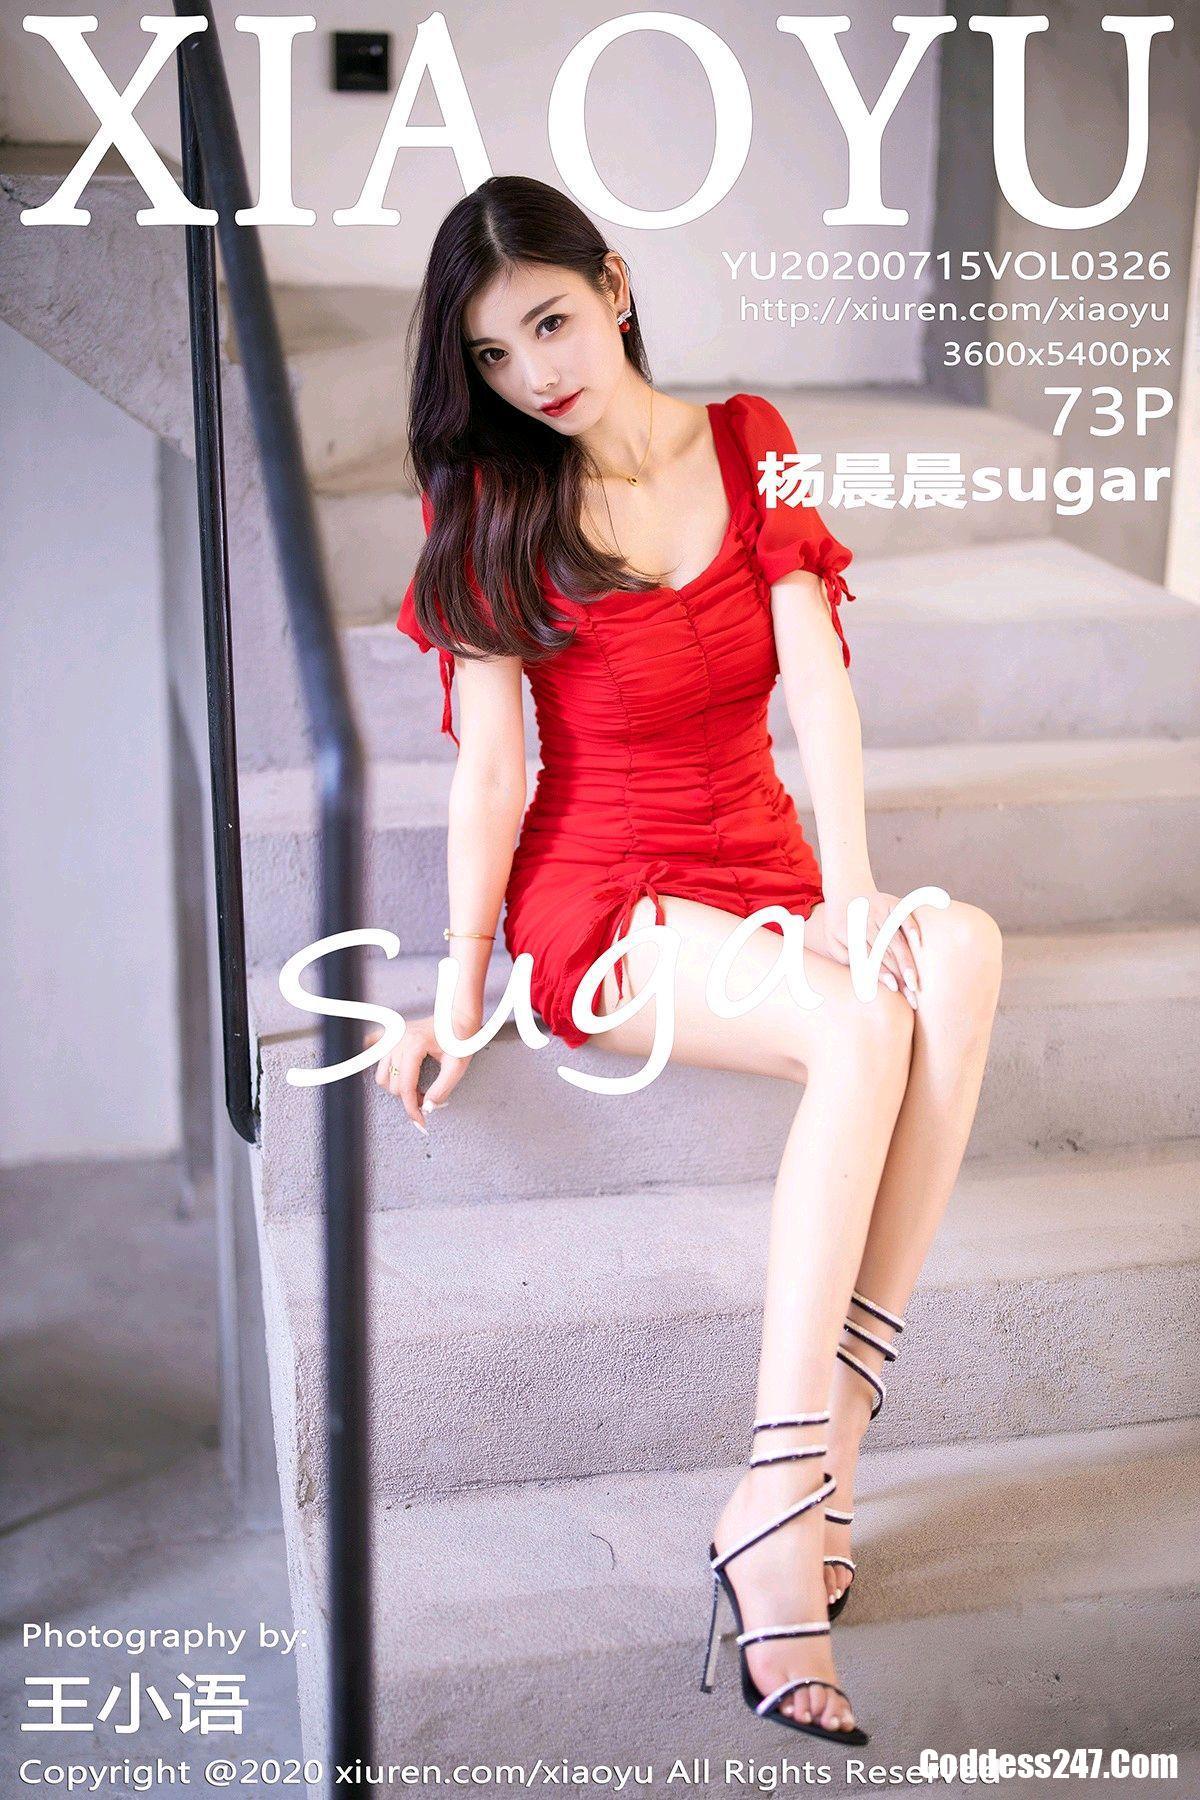 XiaoYu Vol.326 杨晨晨sugar